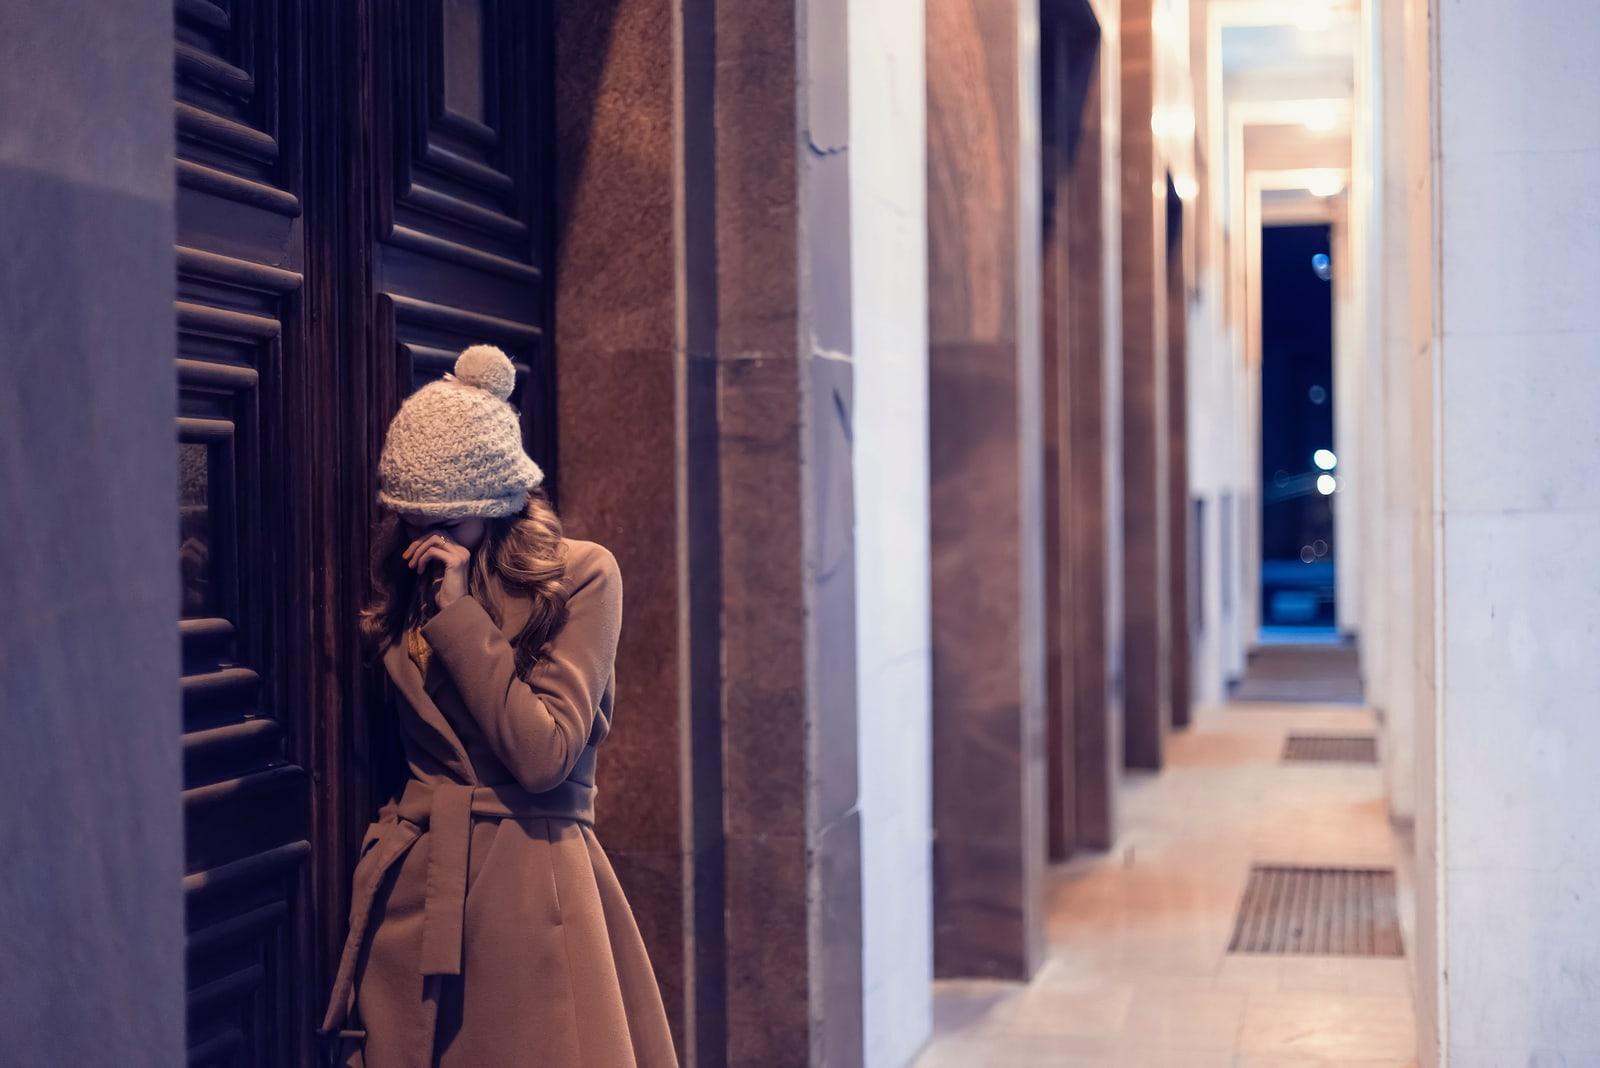 a sad girl in a brown coat stands in the hallway in front of the door